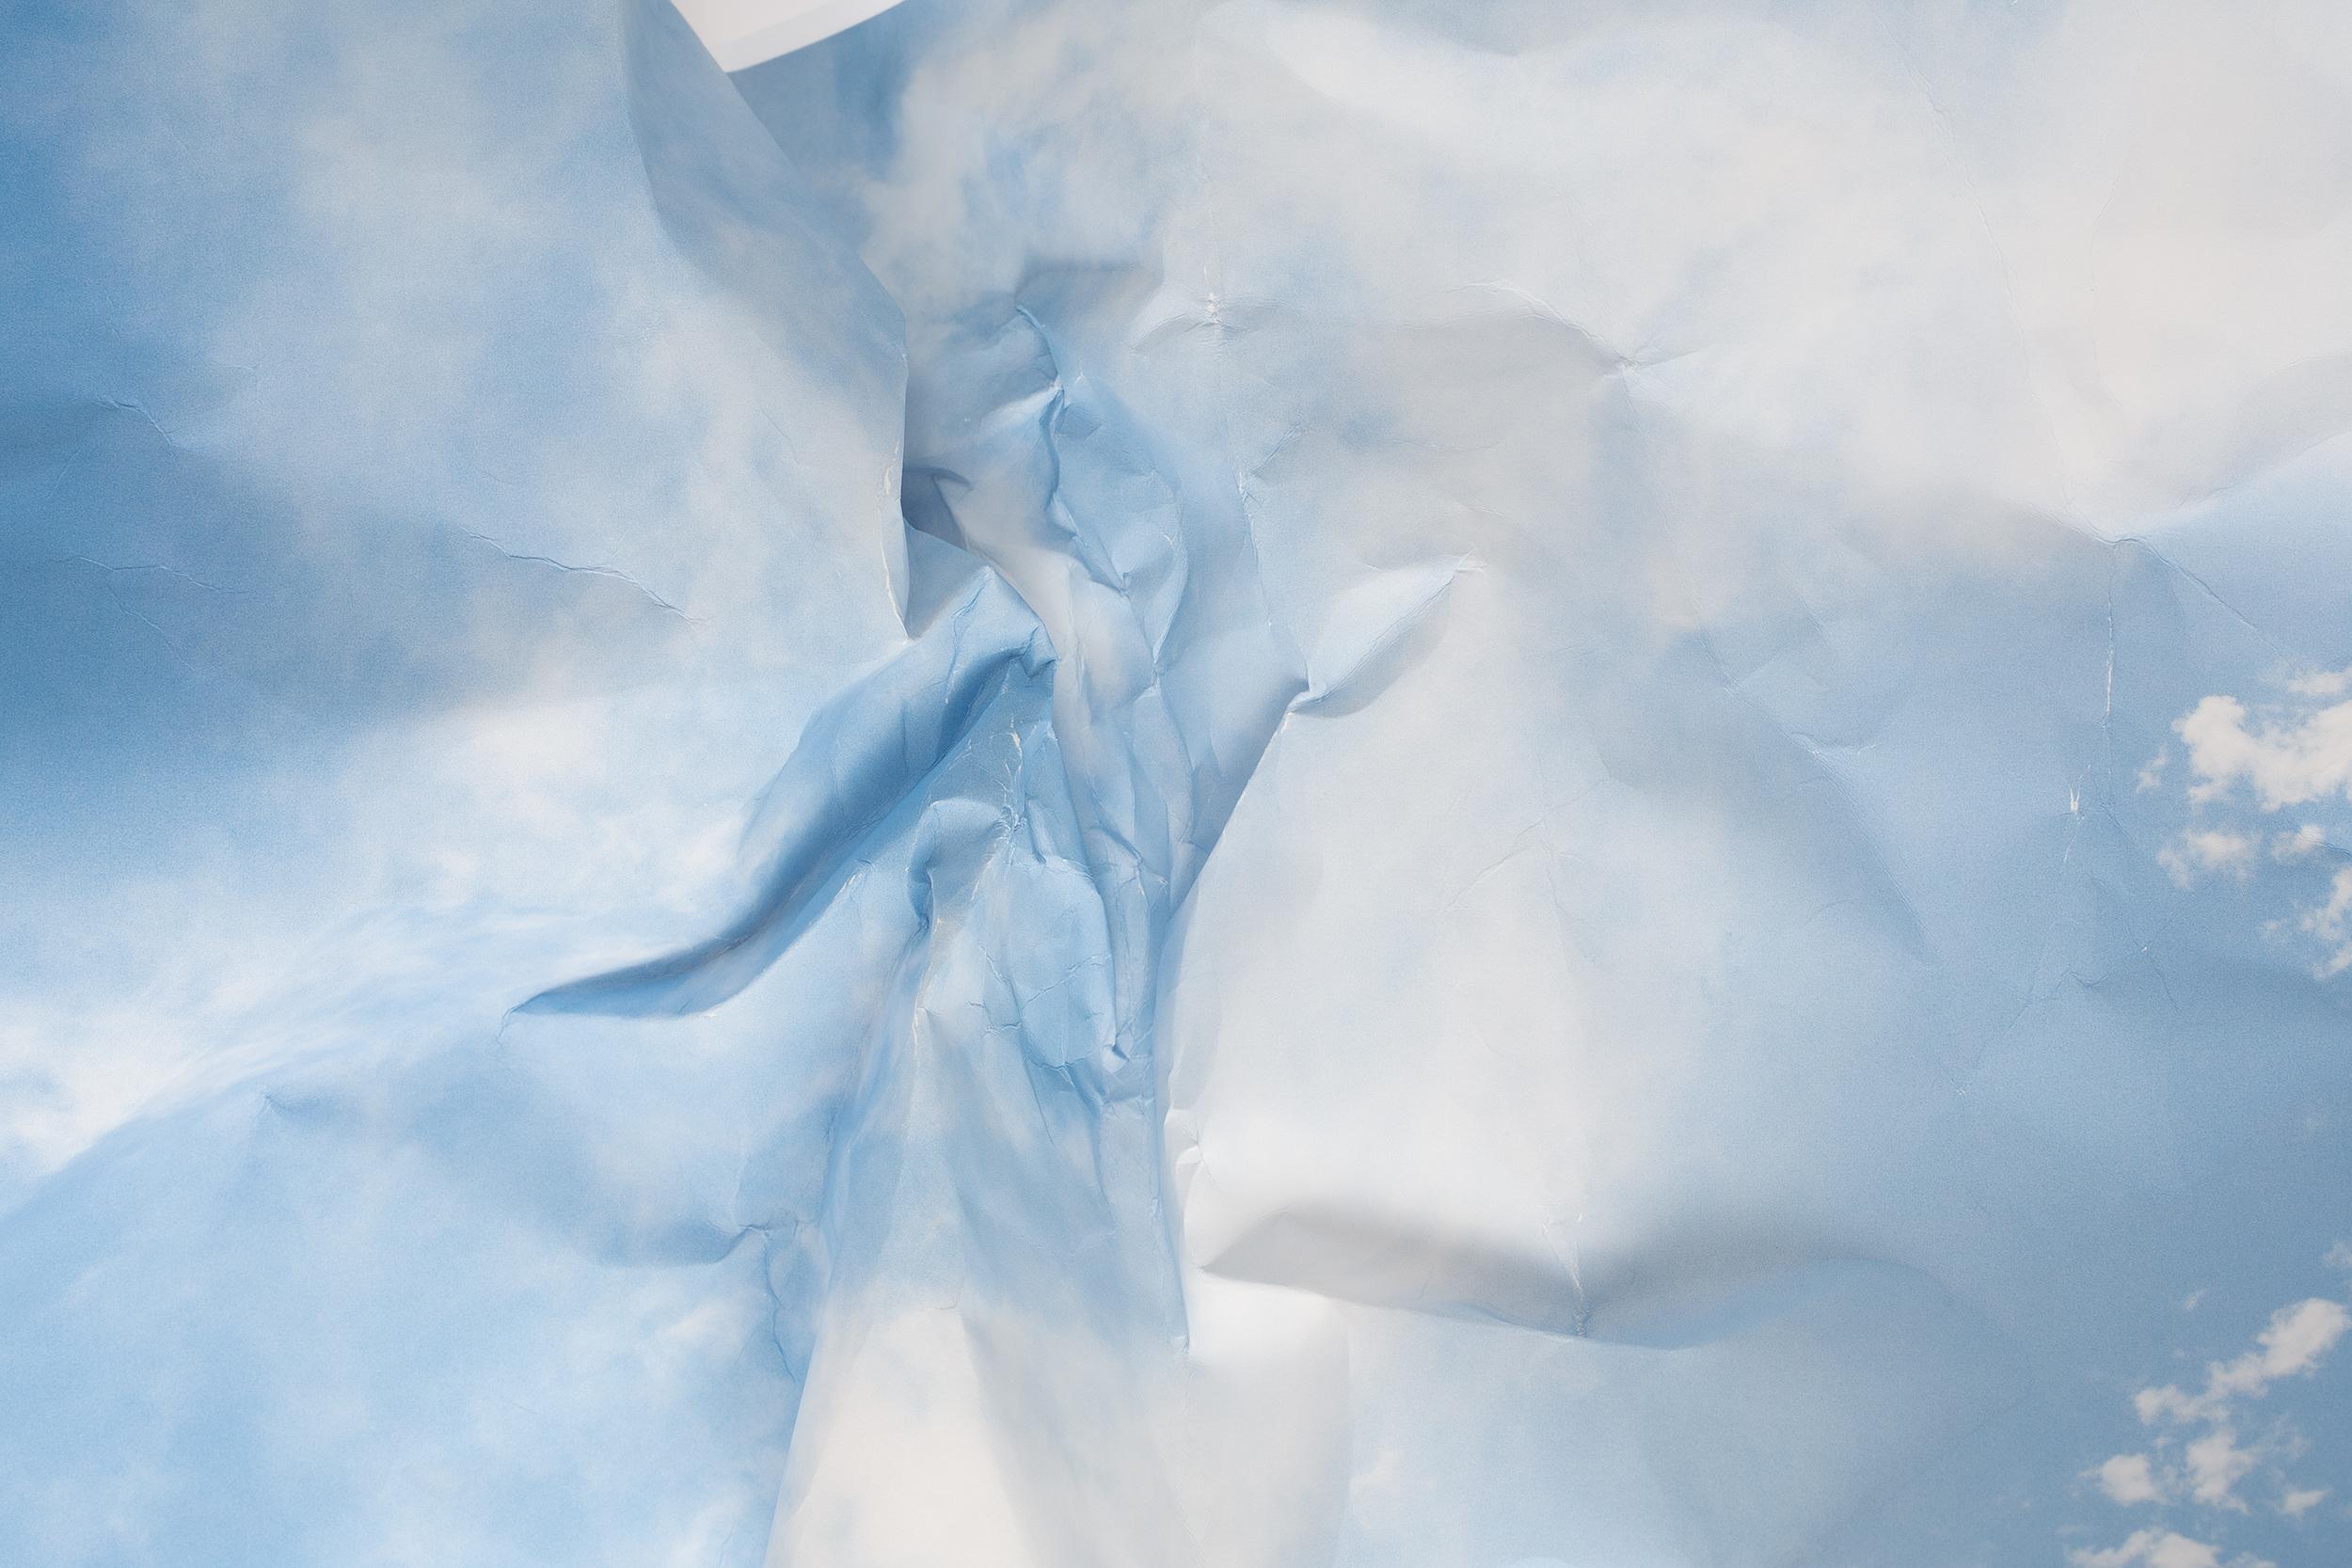 Laura Plageman,  Clouds (No. 1) , 2014  Digital pigment print, 16 x 24 in, edition of 5   Inquire